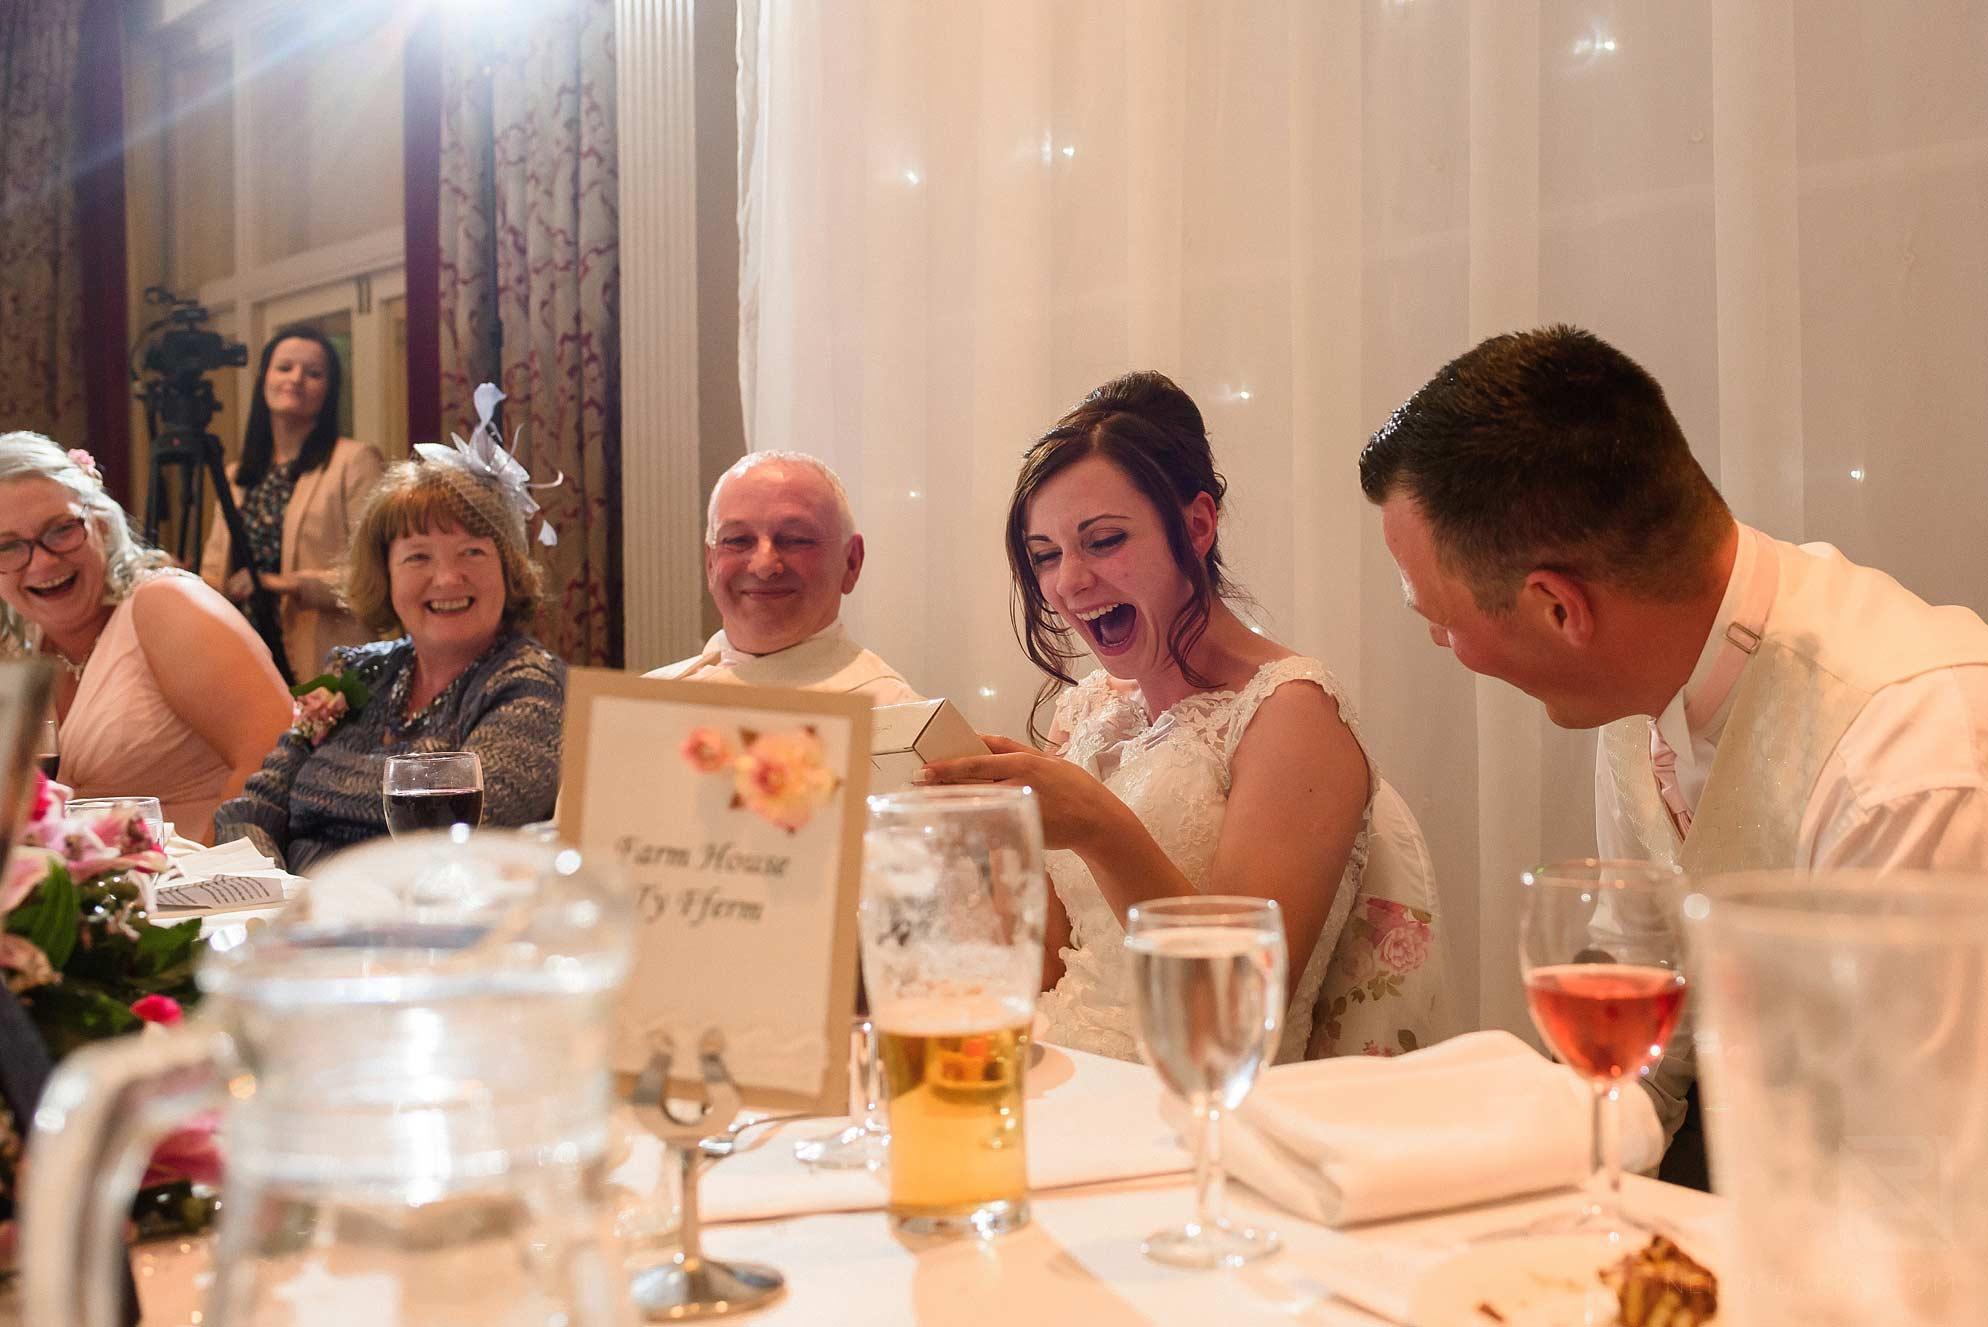 Metropole-Hotel-Llandrindod-Wells-wedding-27